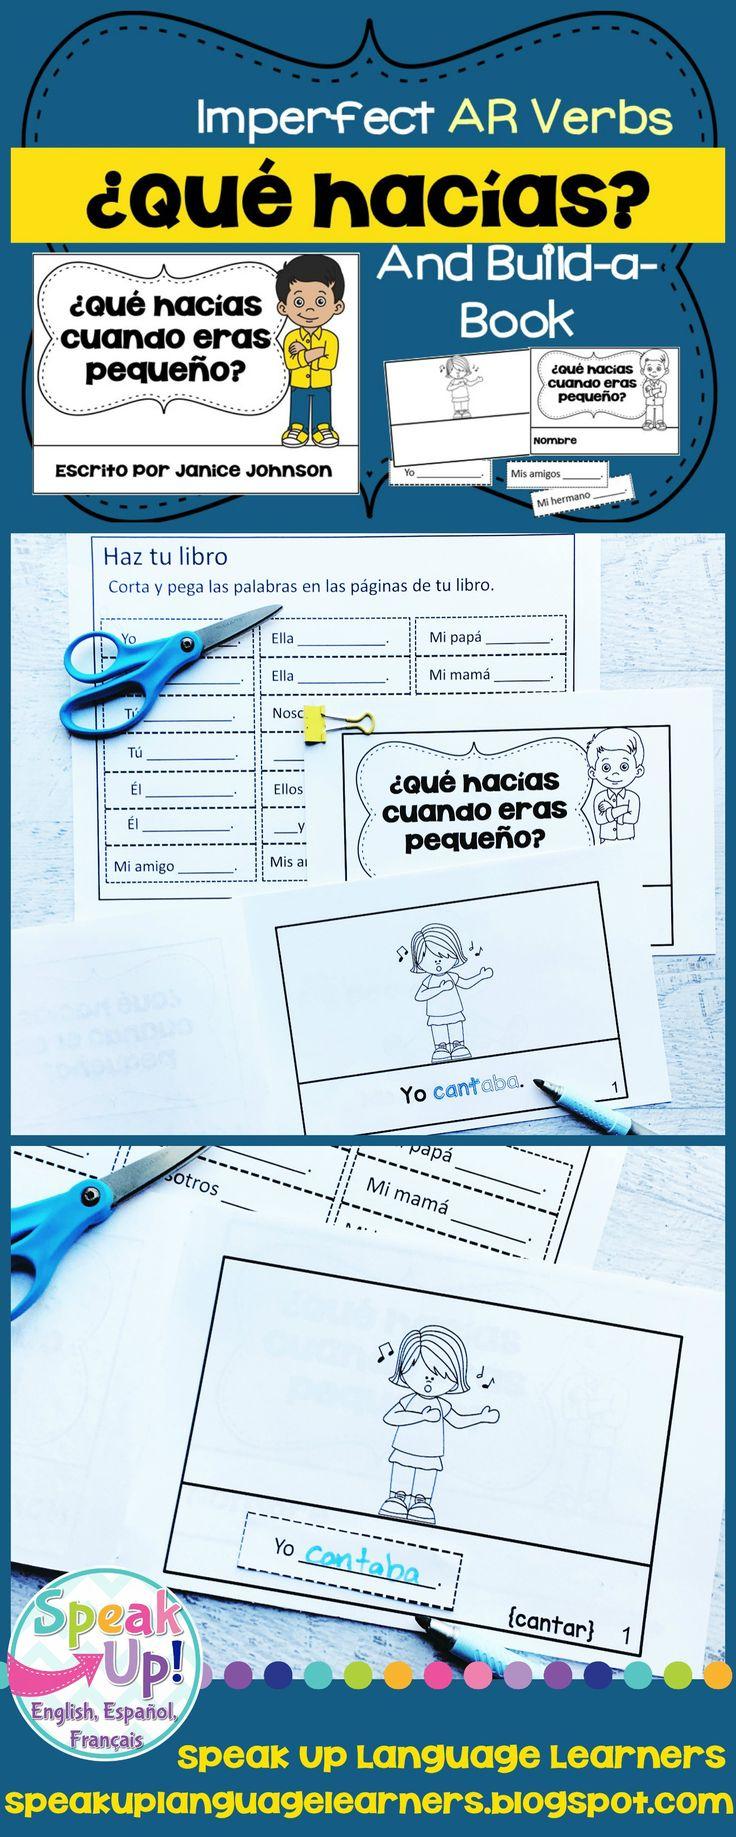 70 best Spanish present tense verbs images on Pinterest | Emergent ...